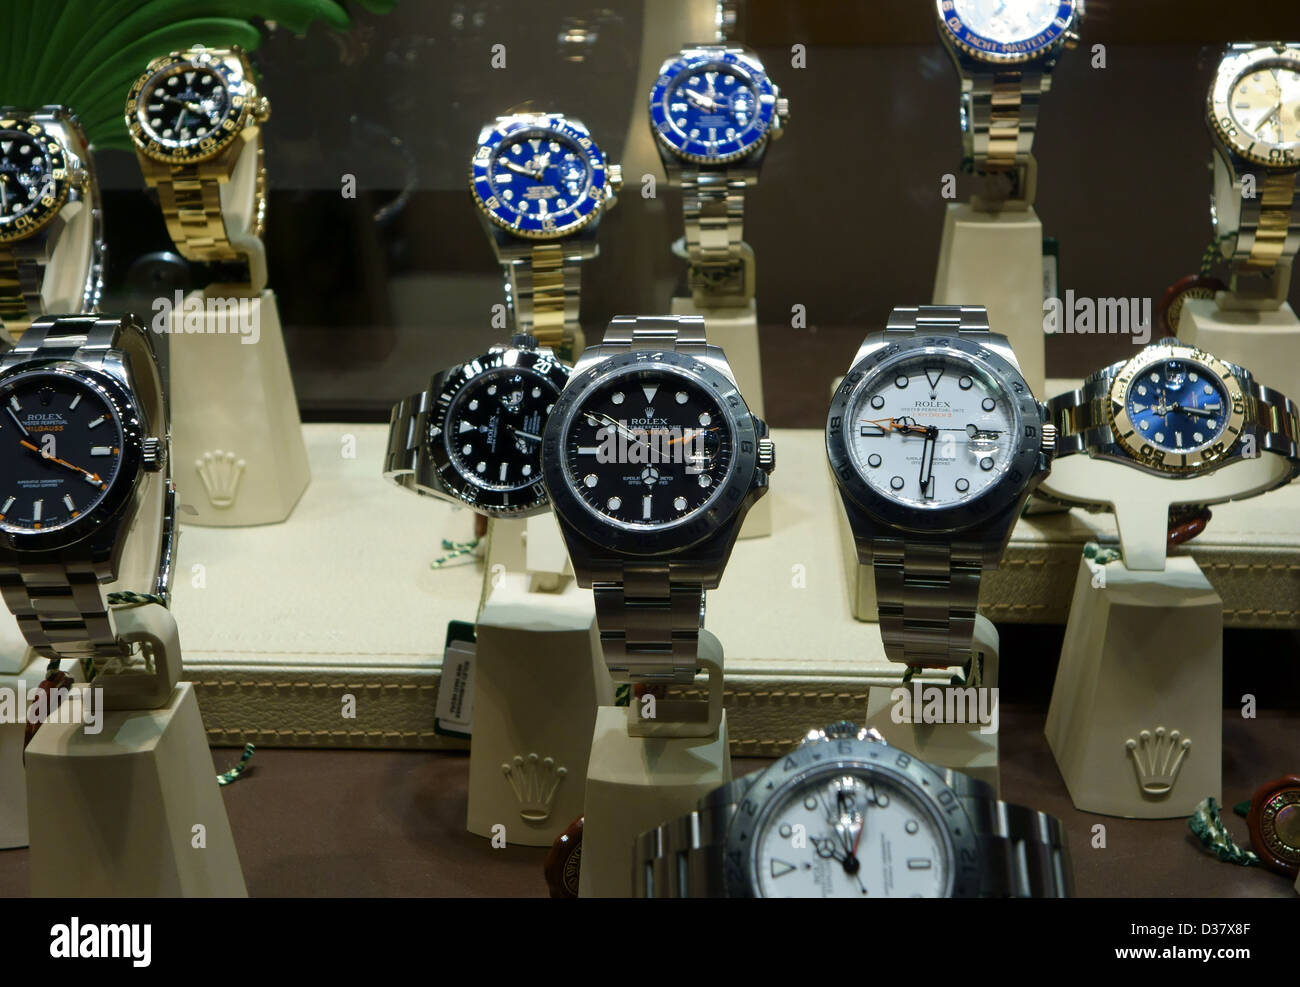 Tienda De Relojes Rolex Ventana Pantalla En La Santa b6gyIfYv7